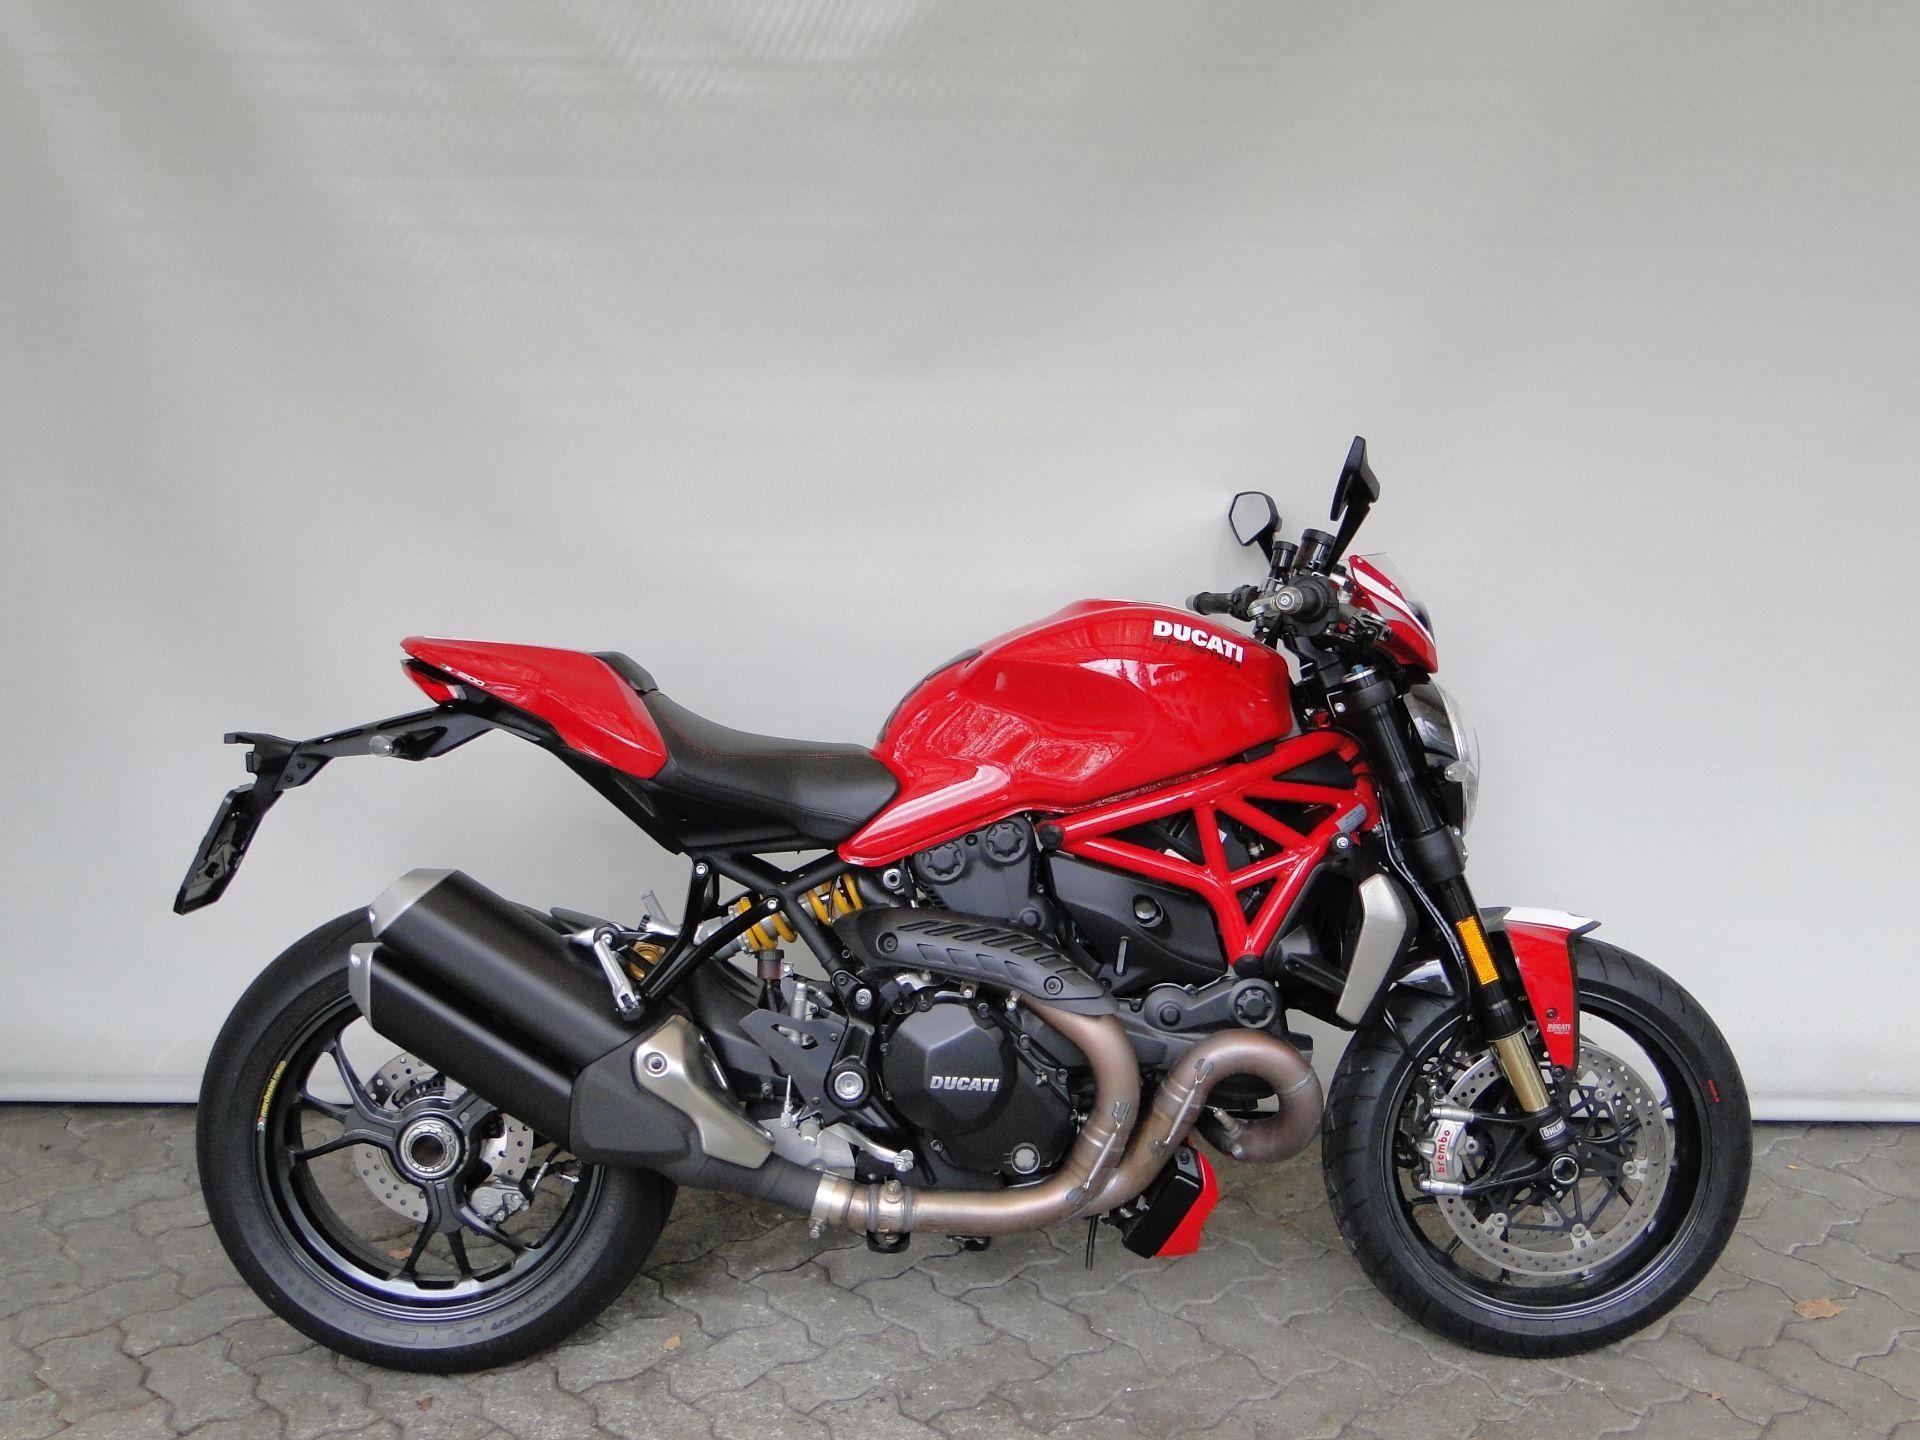 motorrad occasion kaufen ducati 1200 monster r abs hobi moto ag winterthur. Black Bedroom Furniture Sets. Home Design Ideas